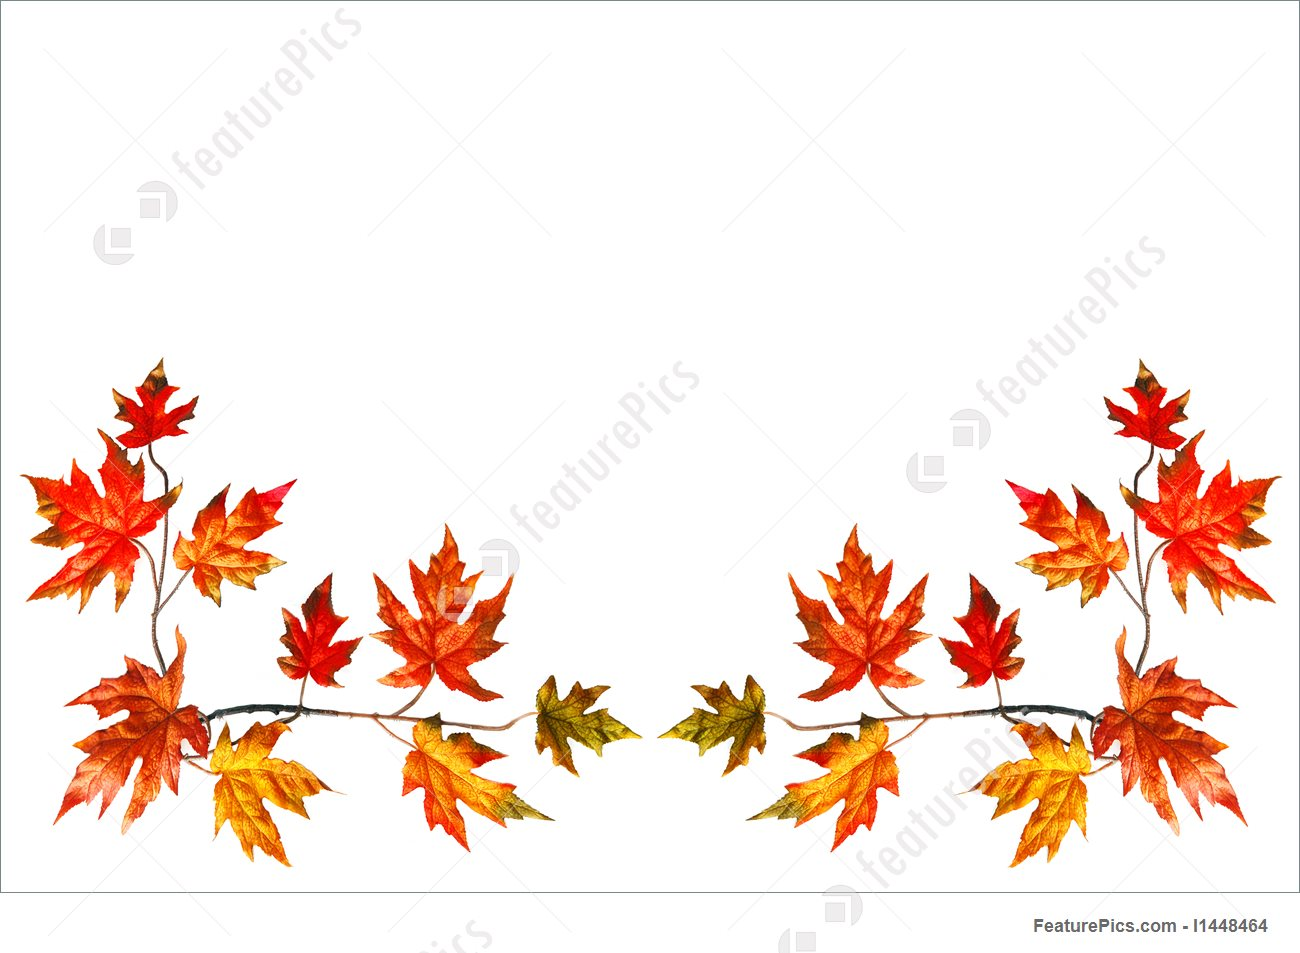 1300x953 Autumn Frame Stock Image I1448464